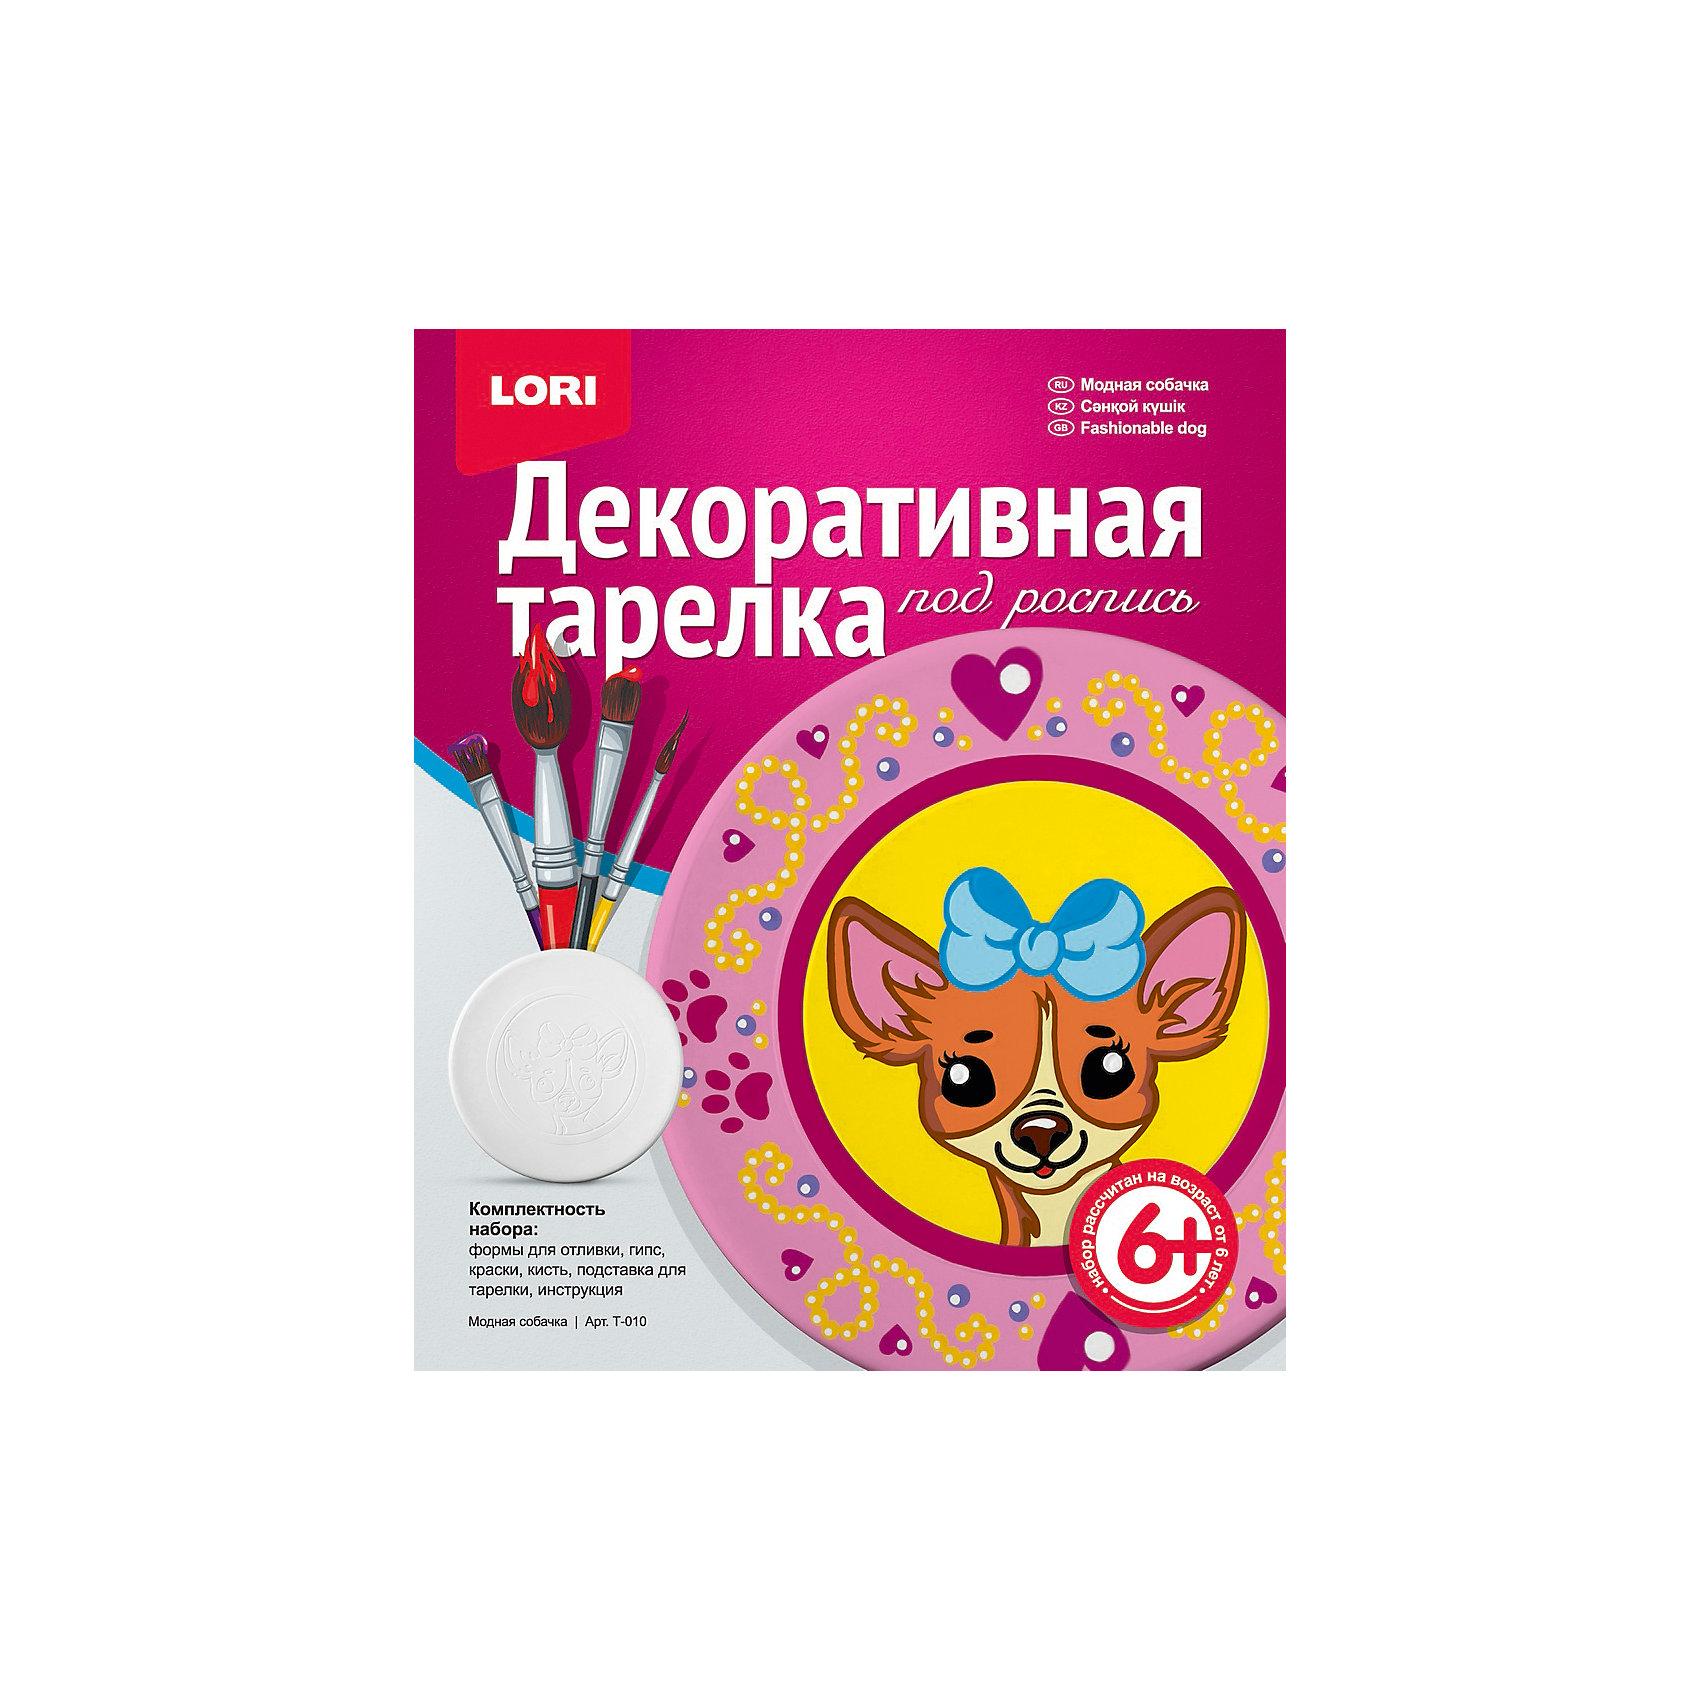 LORI Декоративная тарелка Модная собачка lori магниты из гипса золушка lori